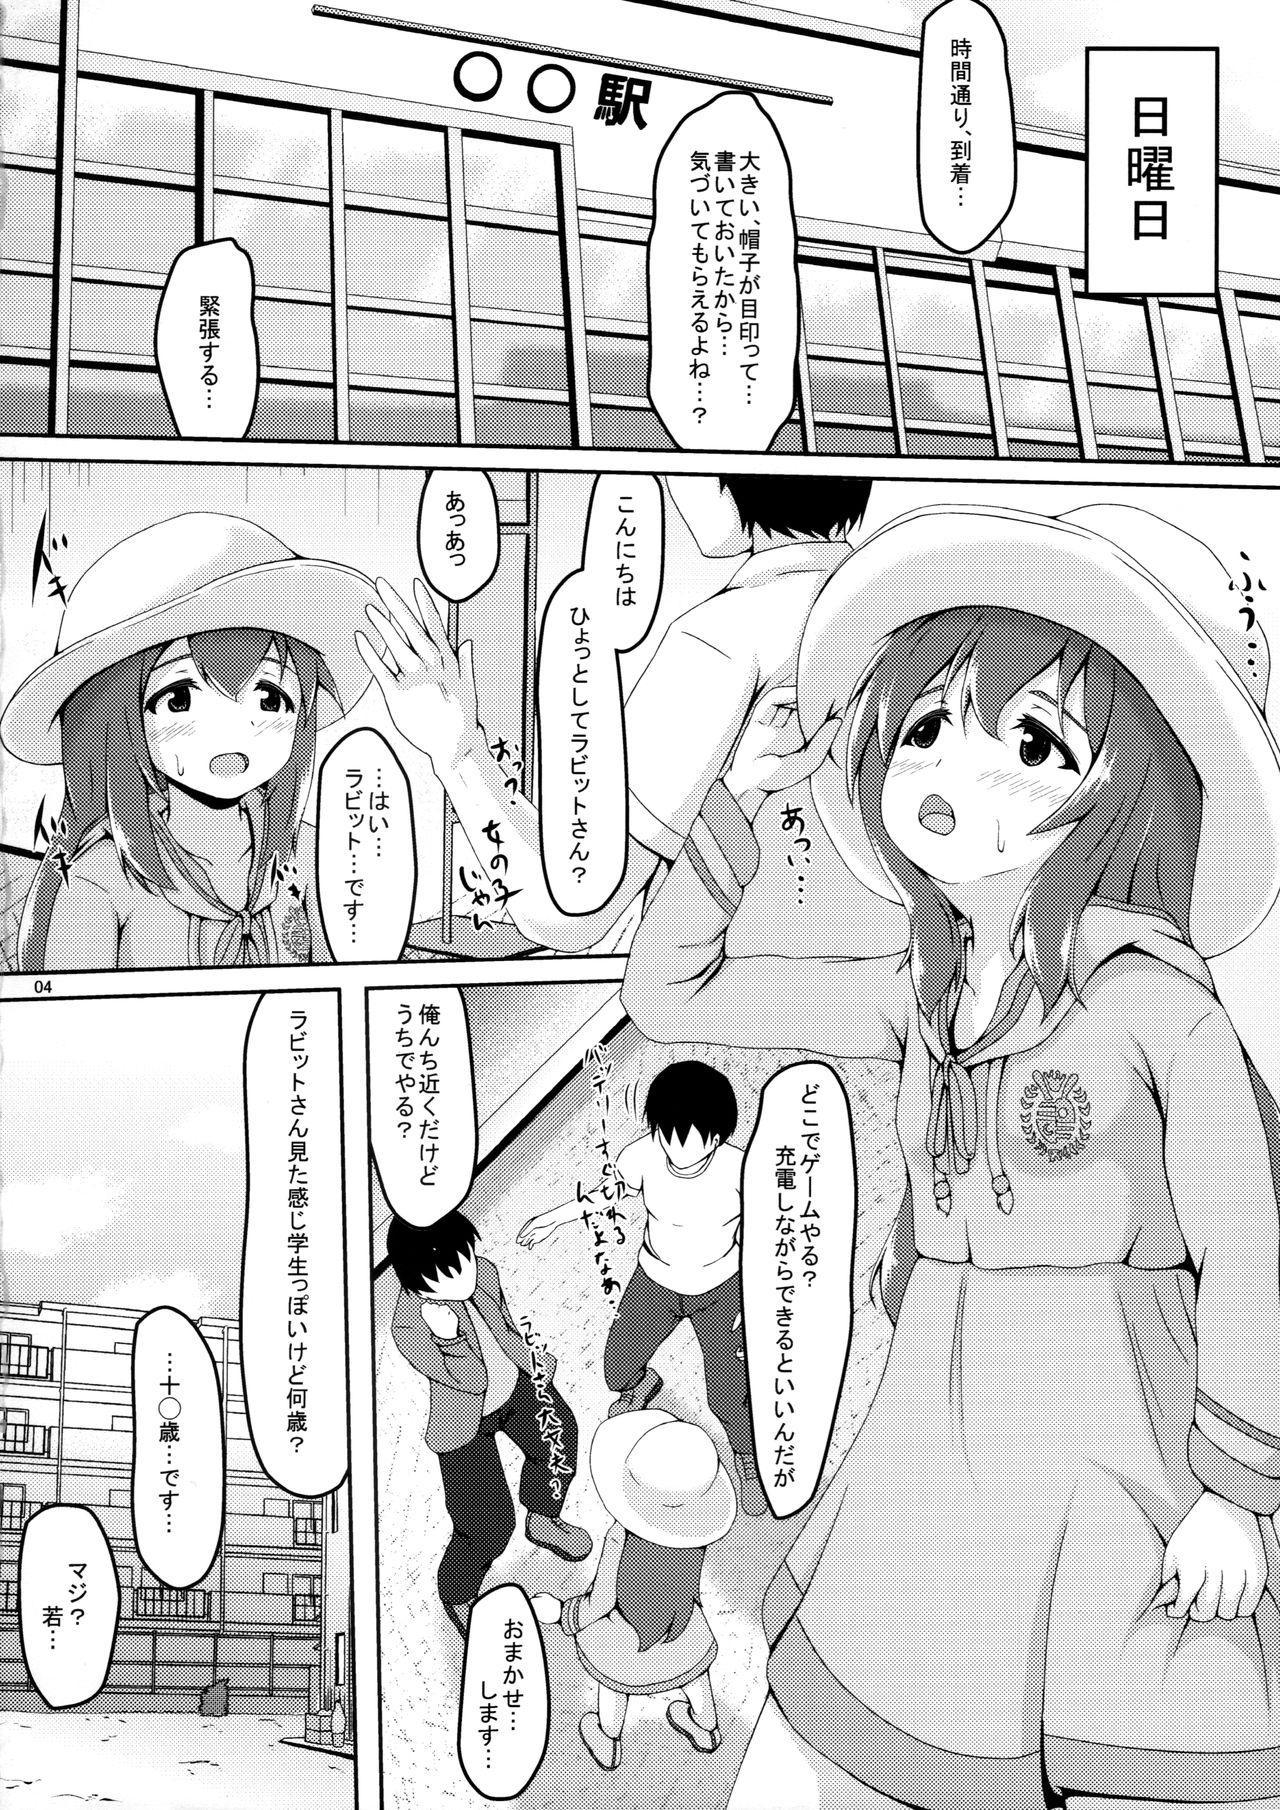 (C96) [Manganiku (Manga)] Off-Anna… Off-Kai de… Off-Pako, Shimasu... (THE IDOLM@STER MILLION LIVE!) 2